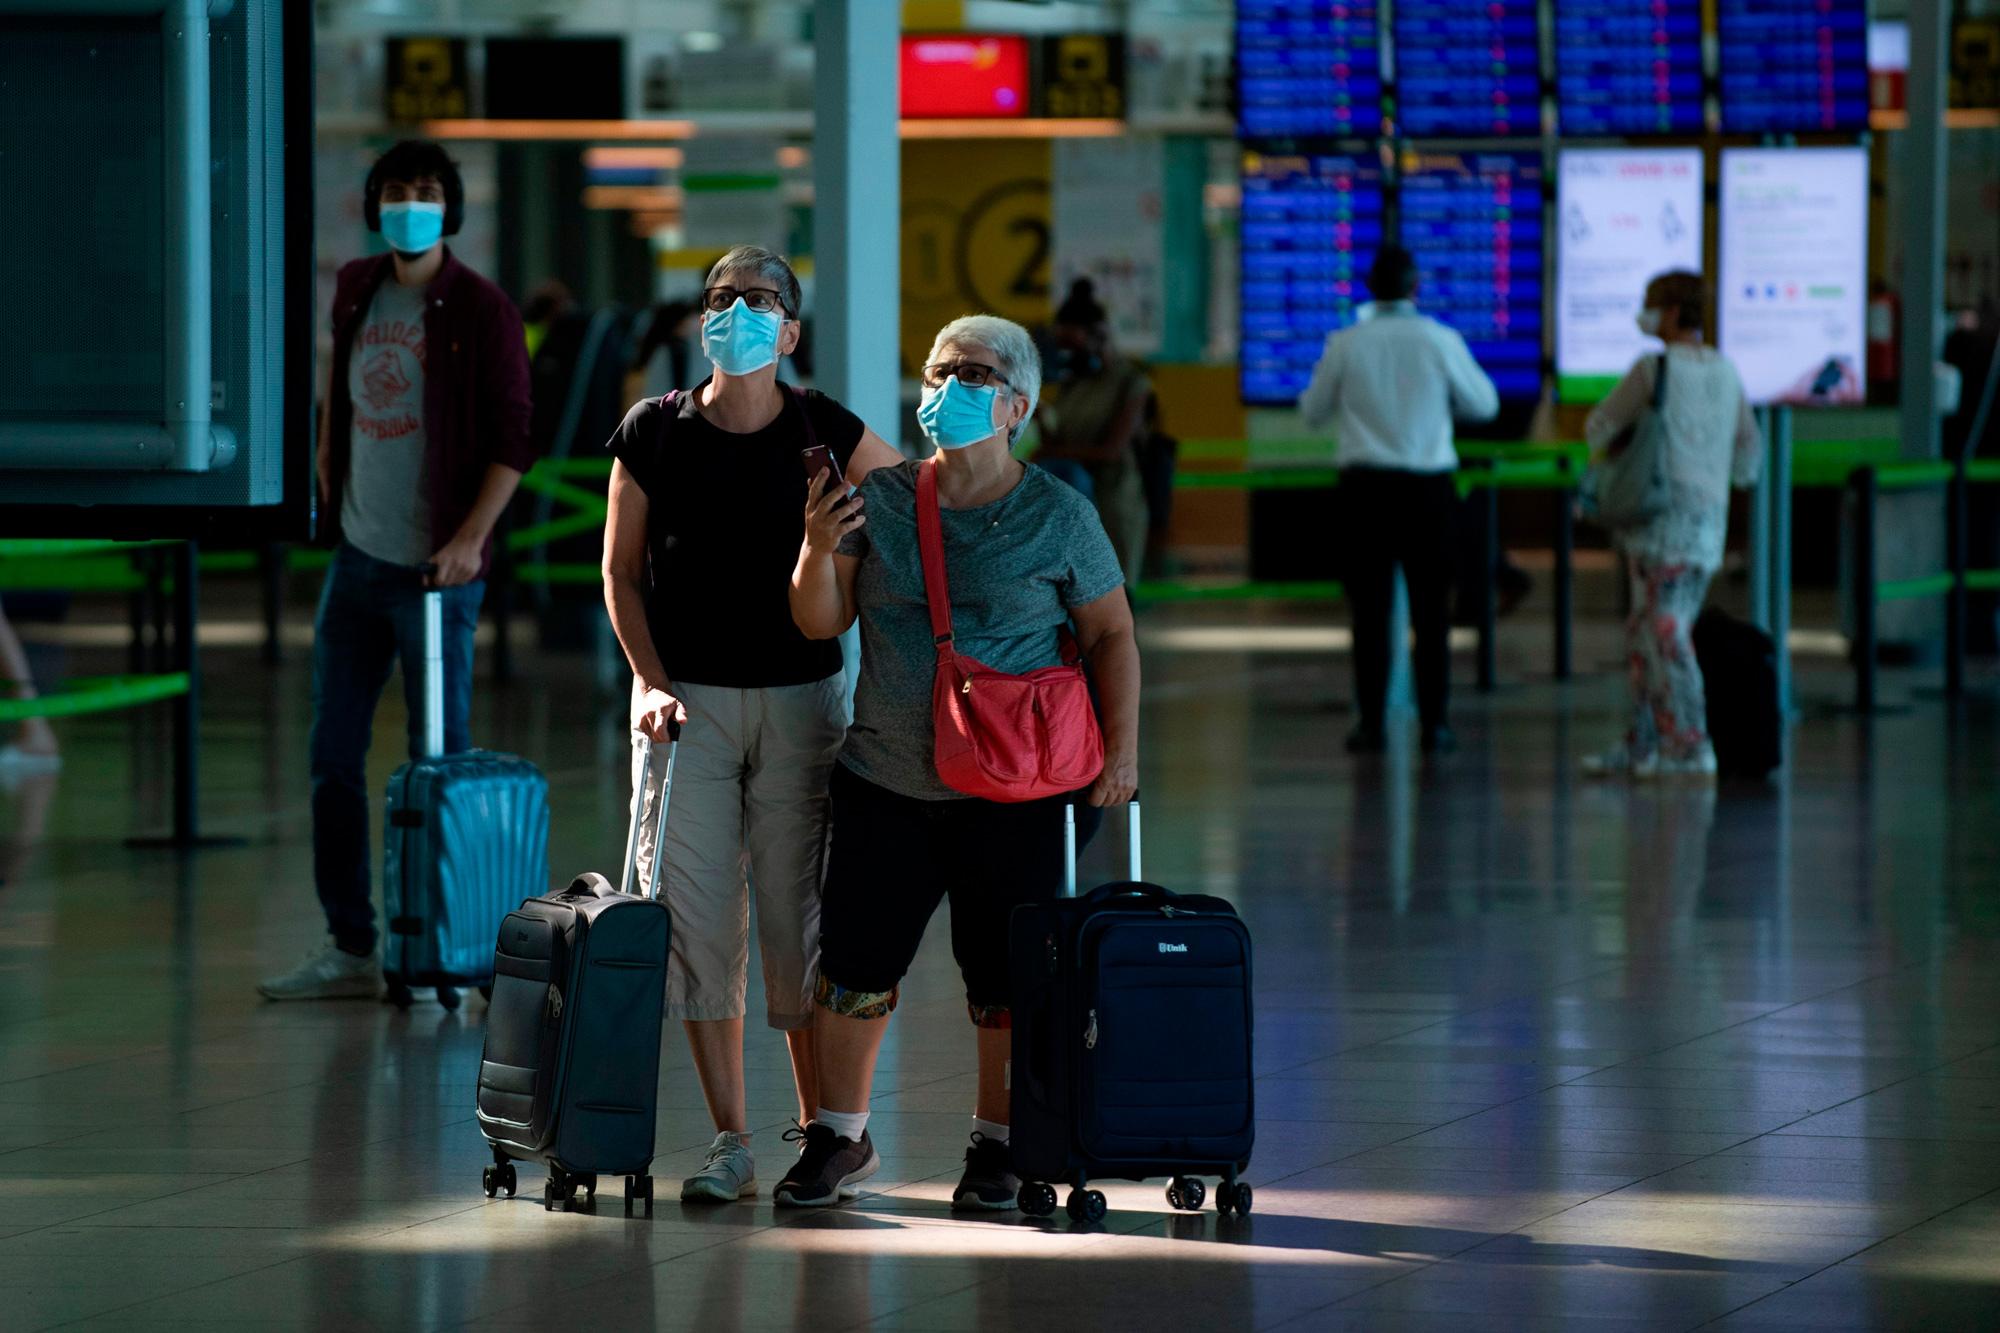 July 6  Passengers check their flight information through screens at Josep Tarradellas Barcelona-El Prat Airport at El Prat de Llobregat.